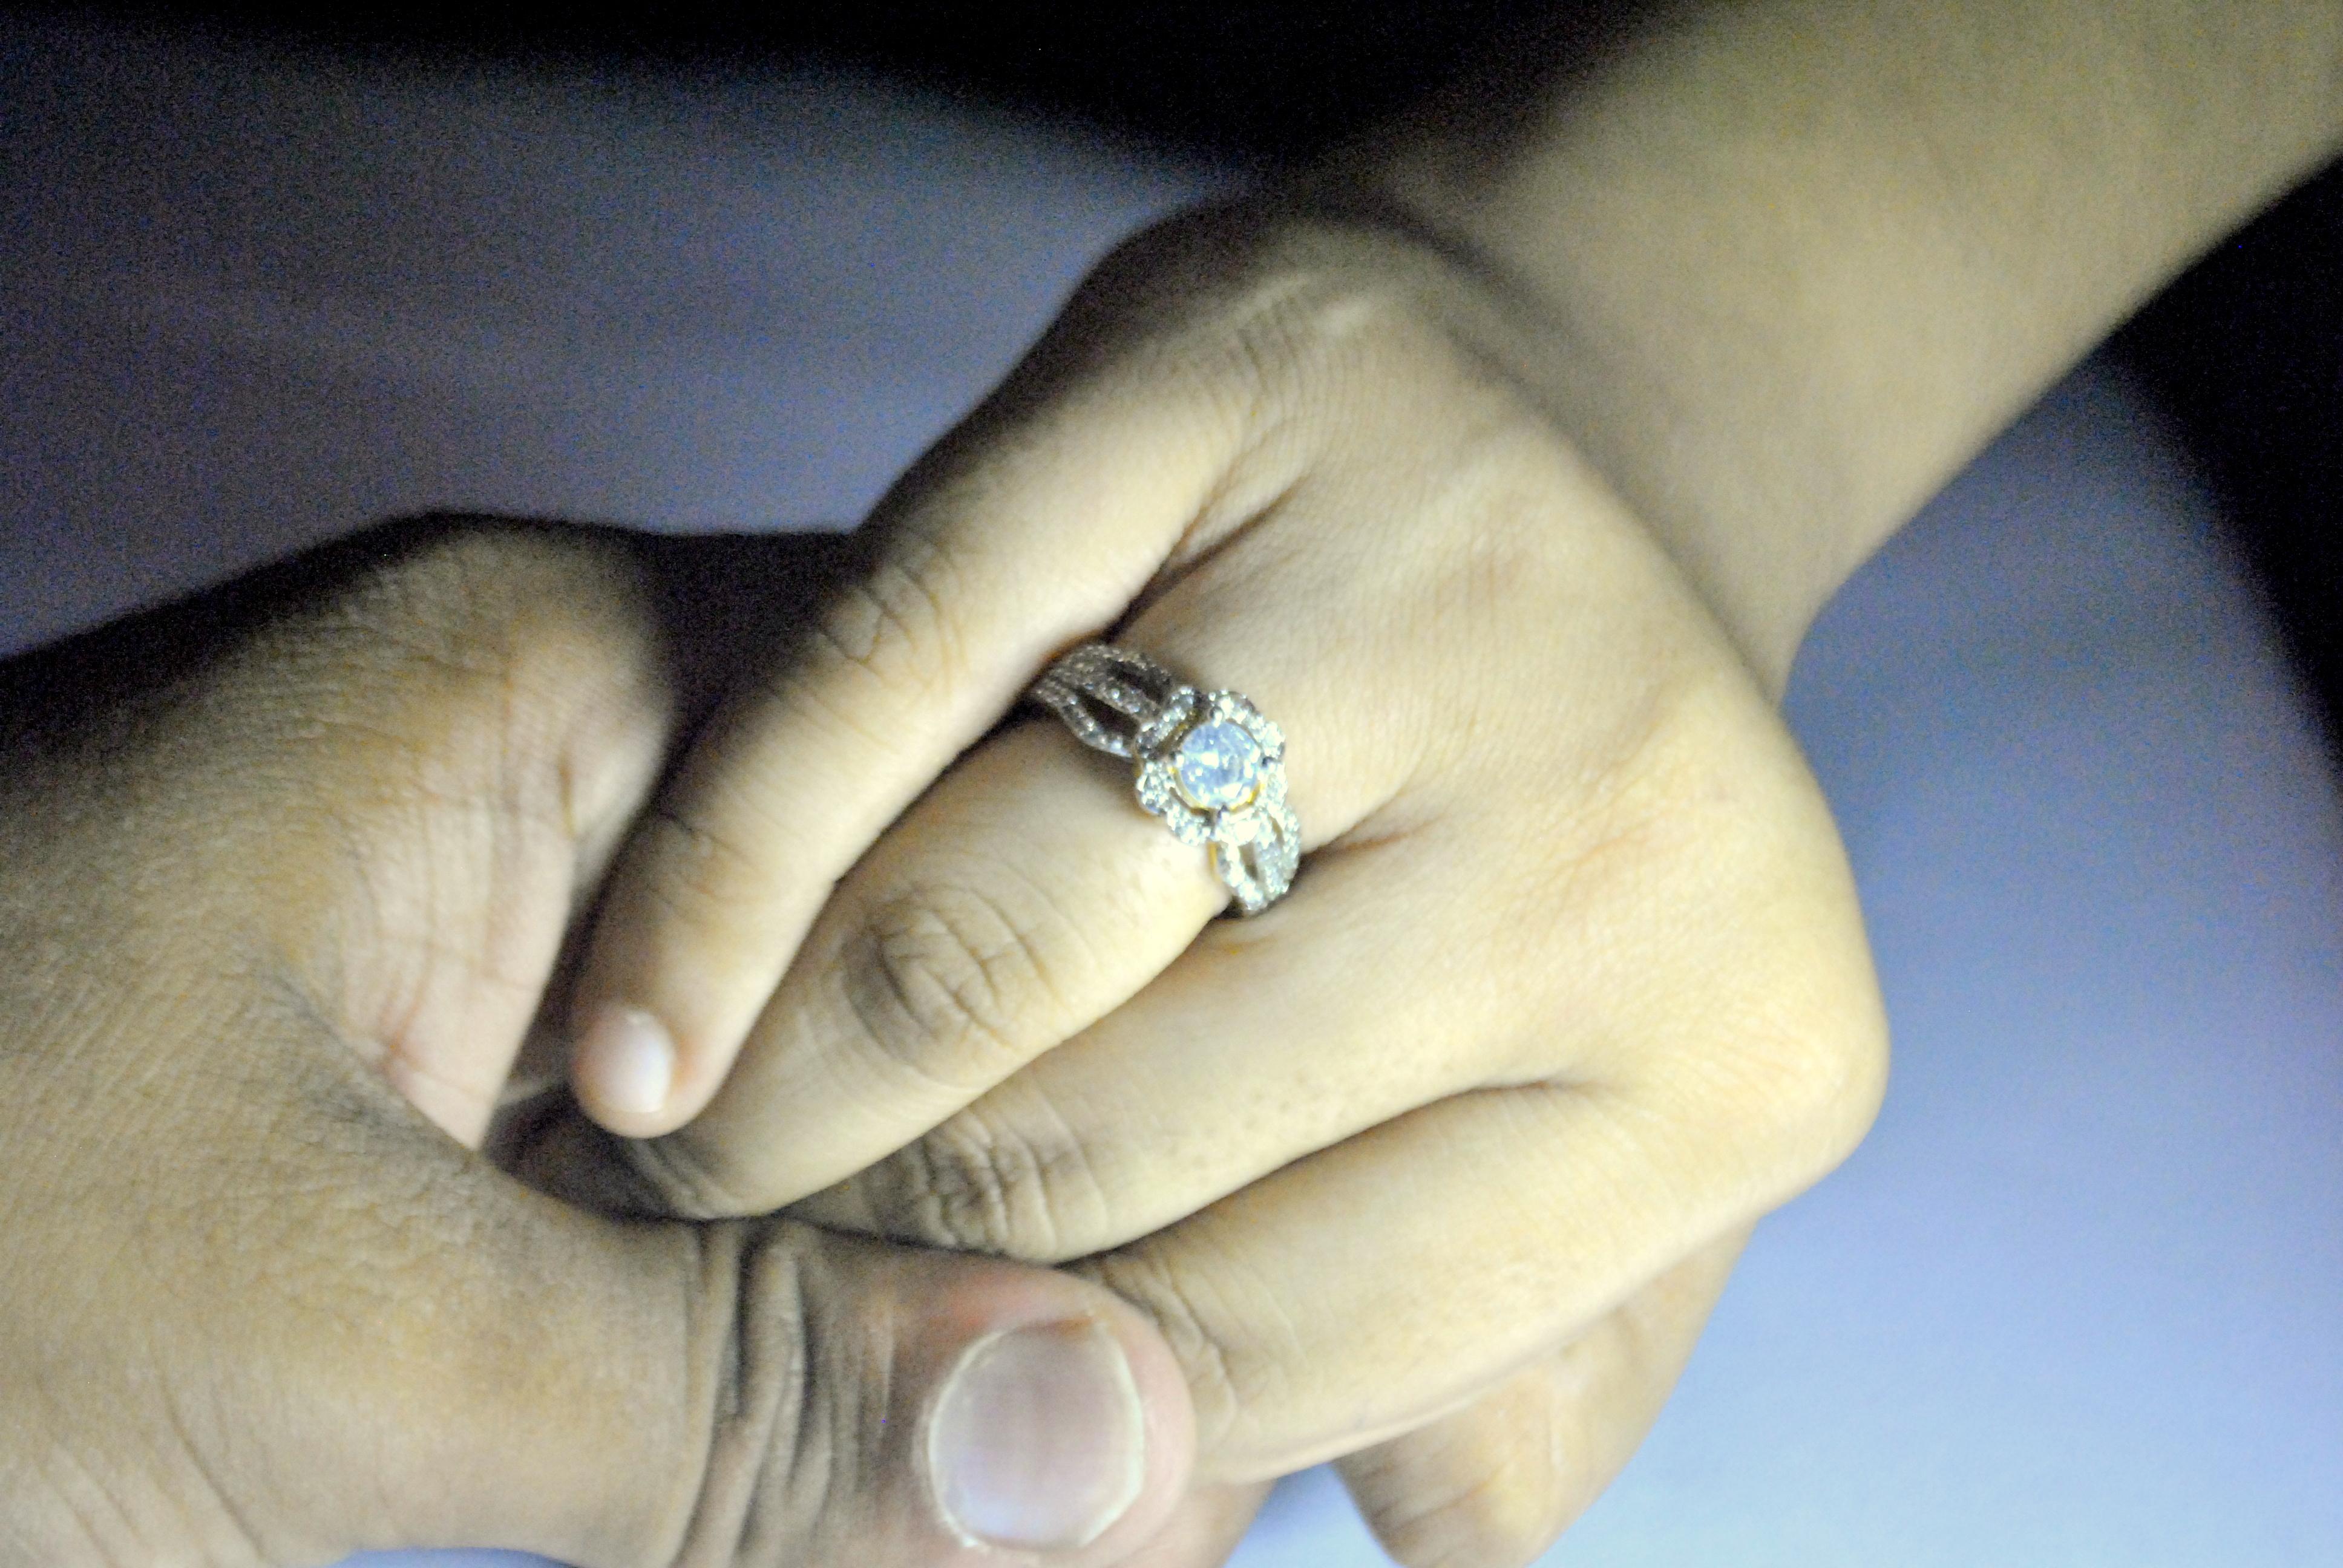 Couple Hands Ring : Public Domain Pictures